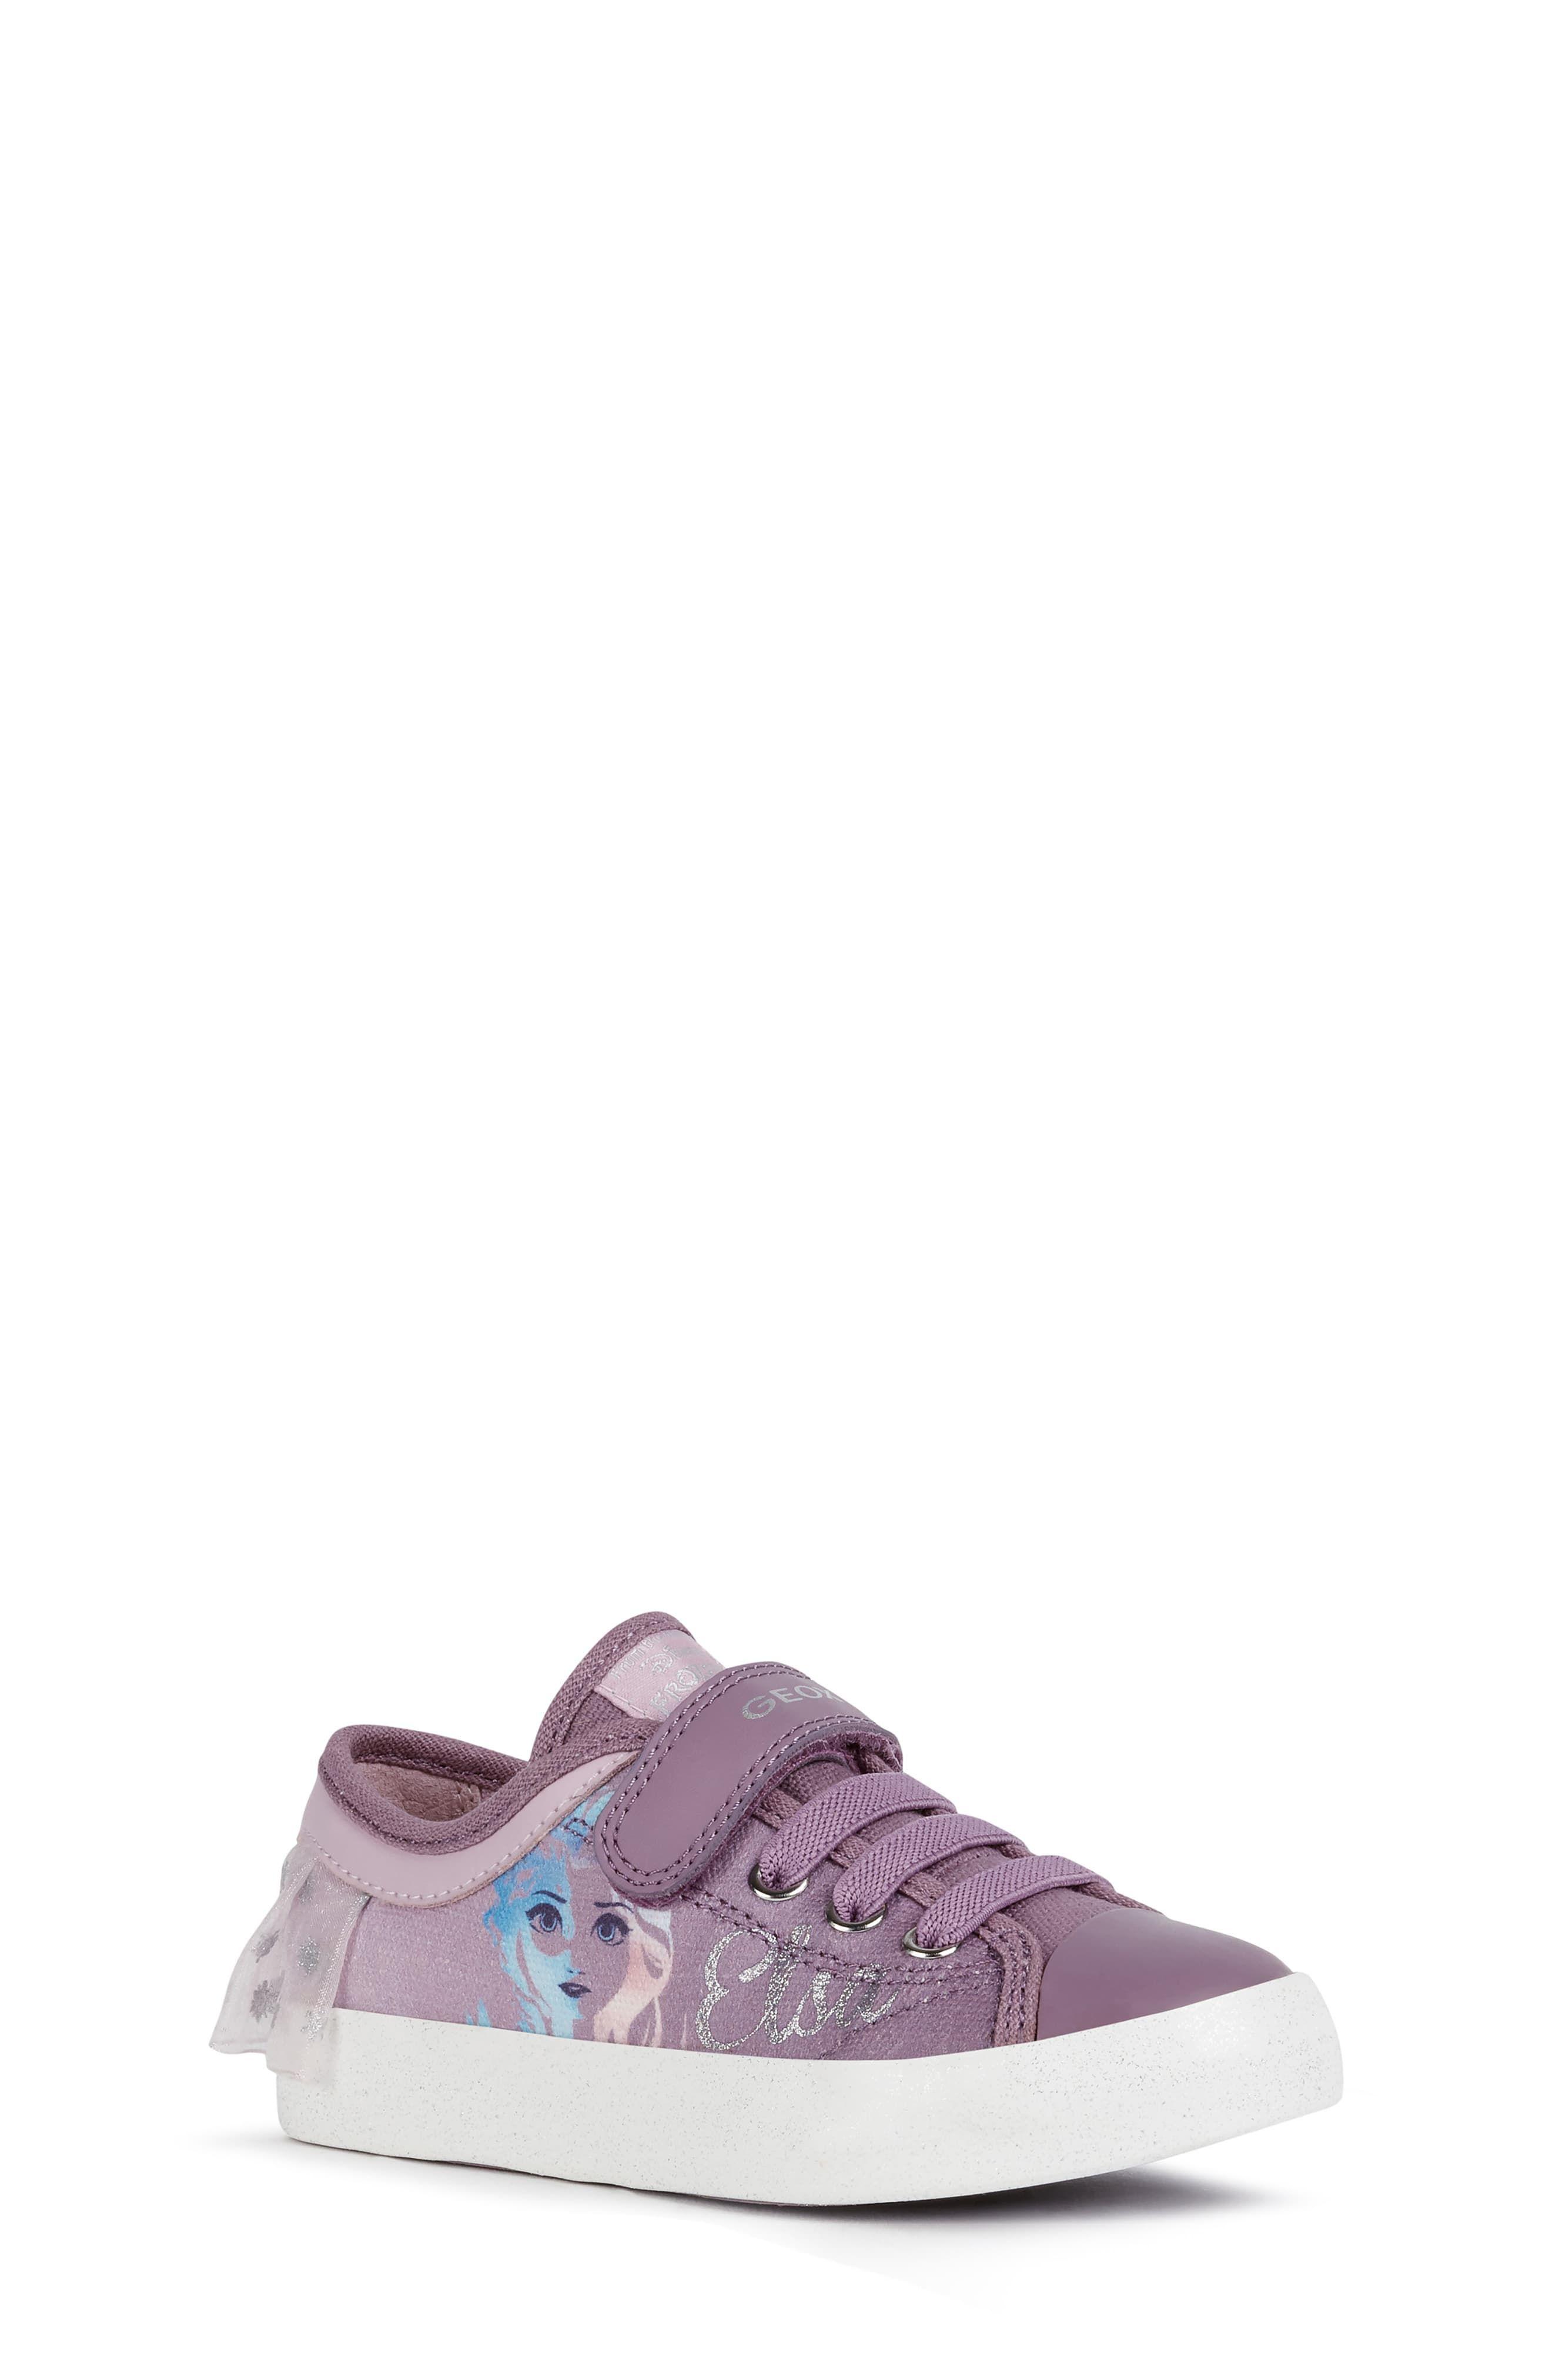 Disney Ciak 75 Frozen Sneaker (Toddler